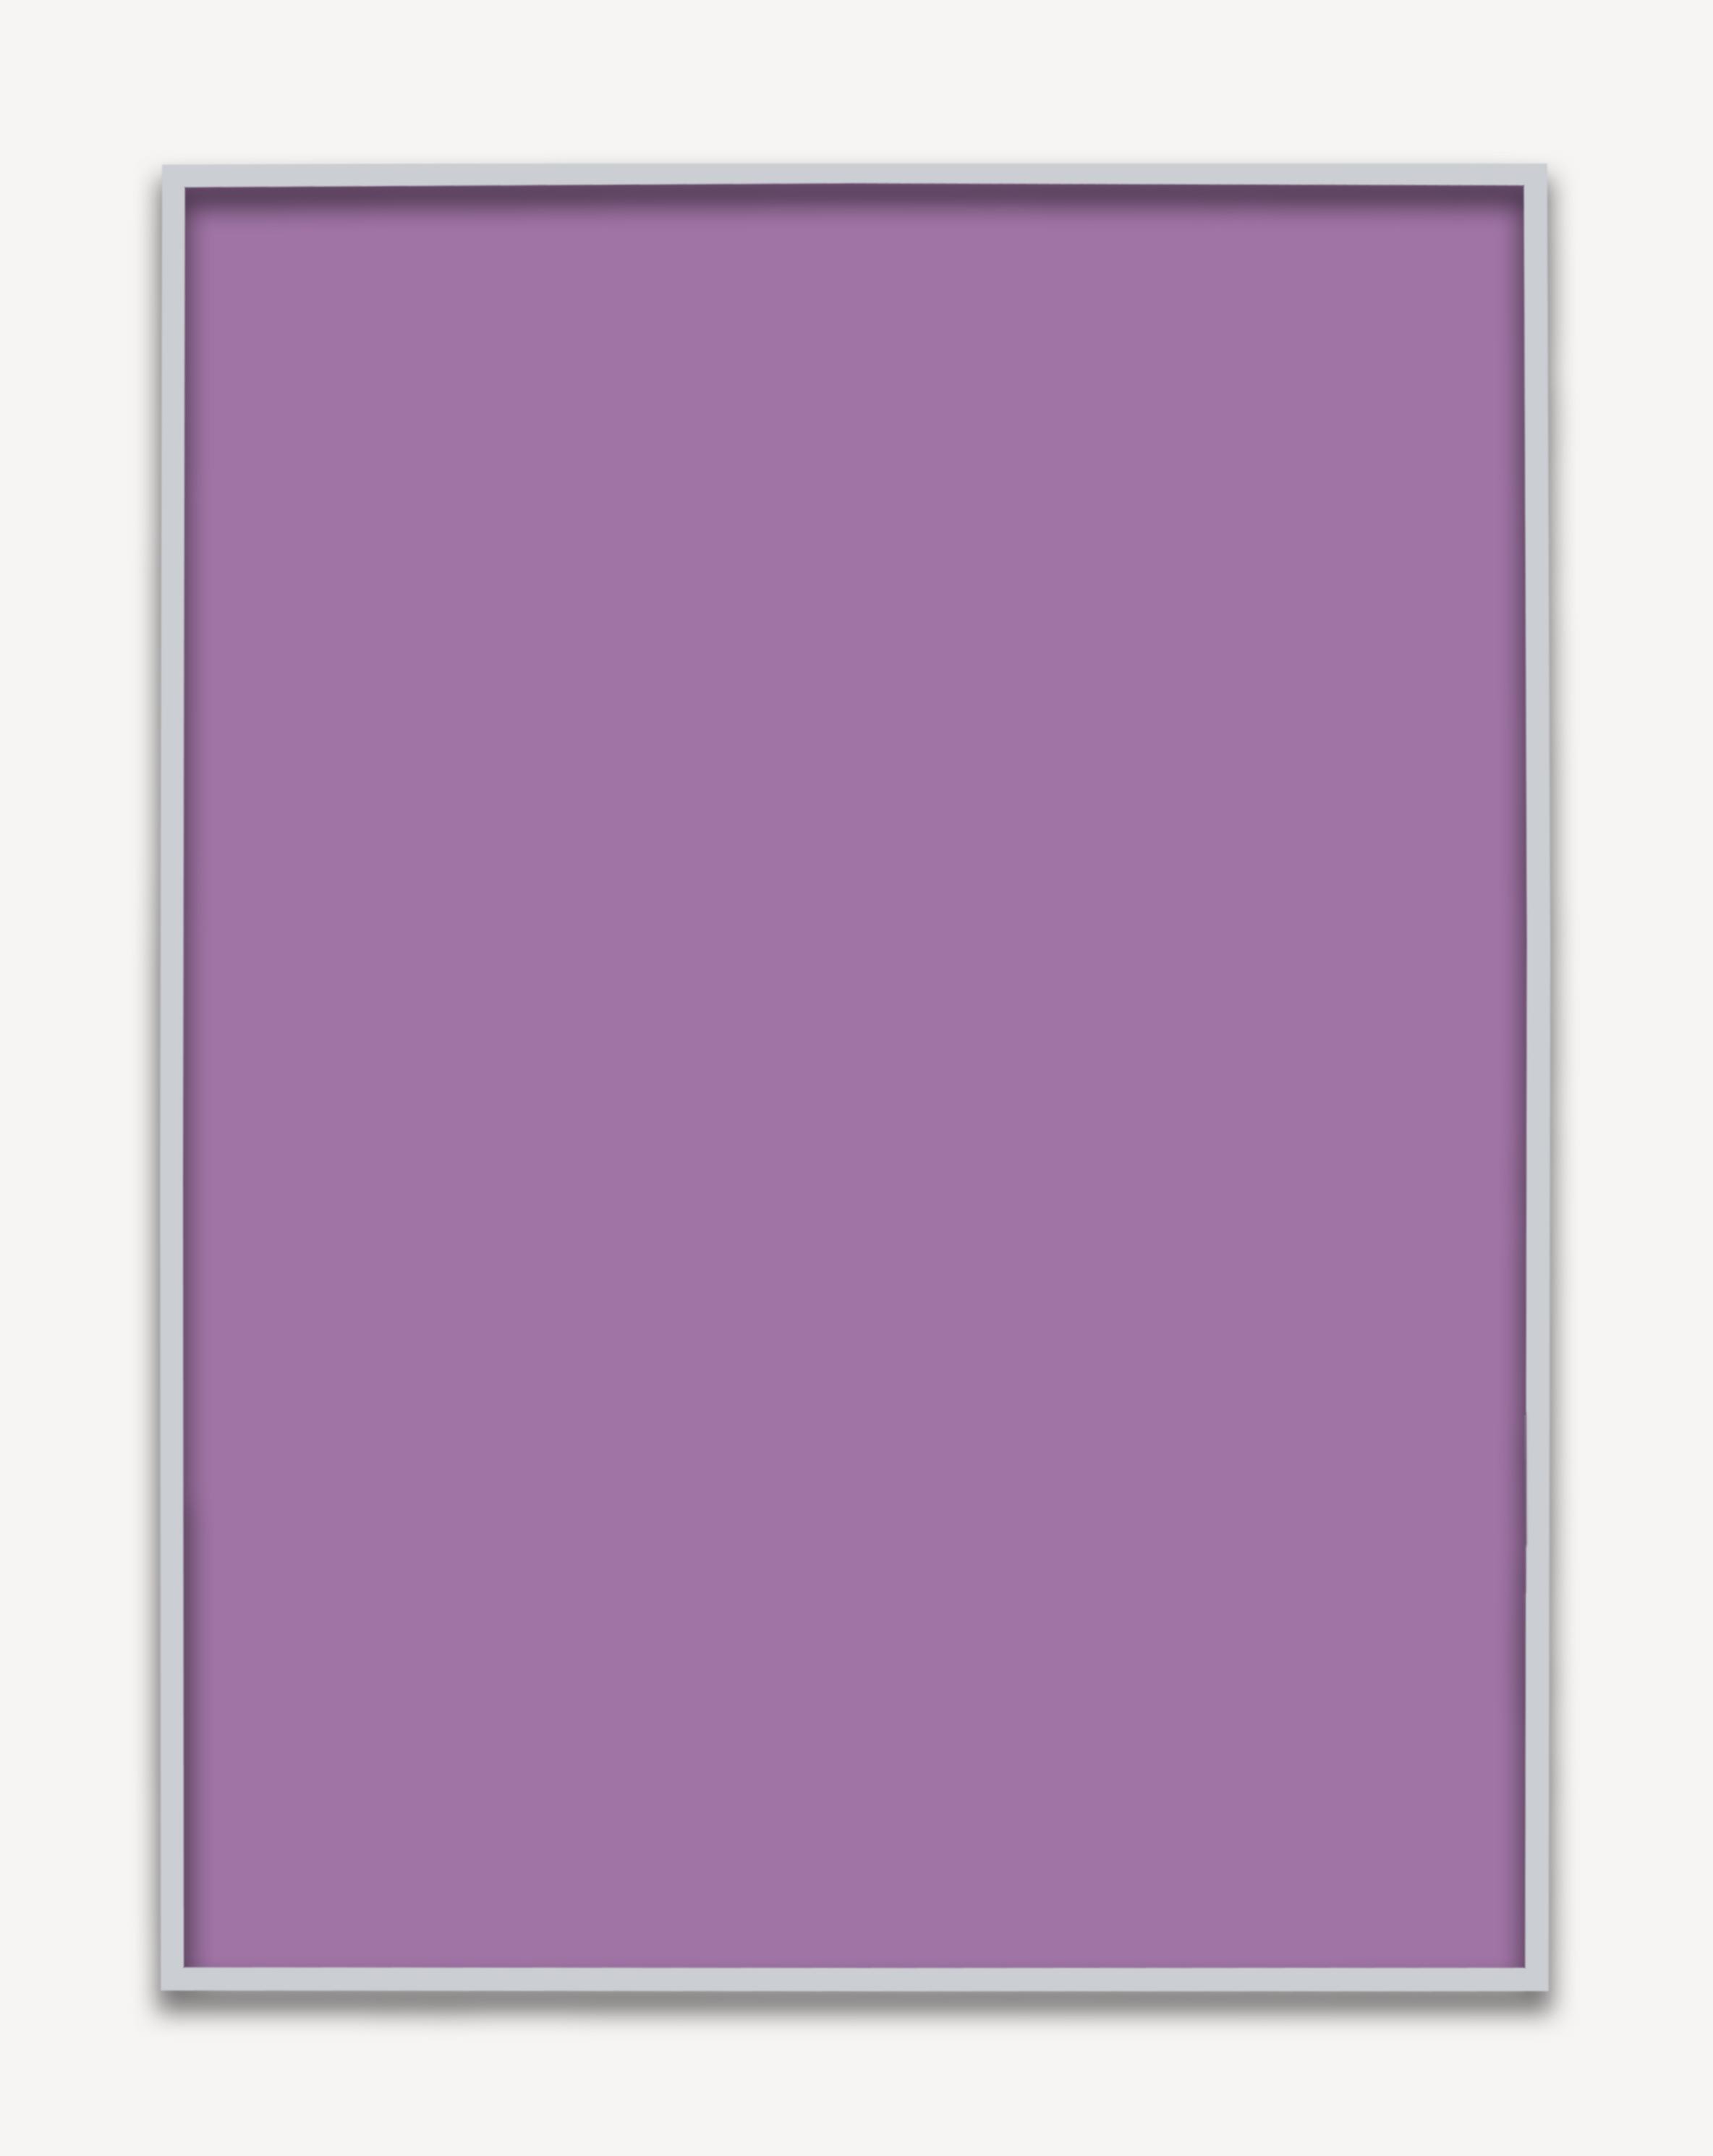 Untitled (Purple Monochrome 02), 2015 unique chromogenic print 153,5 x 123,5 cm - 60 3/8 x 48 5/8 inches (framed)